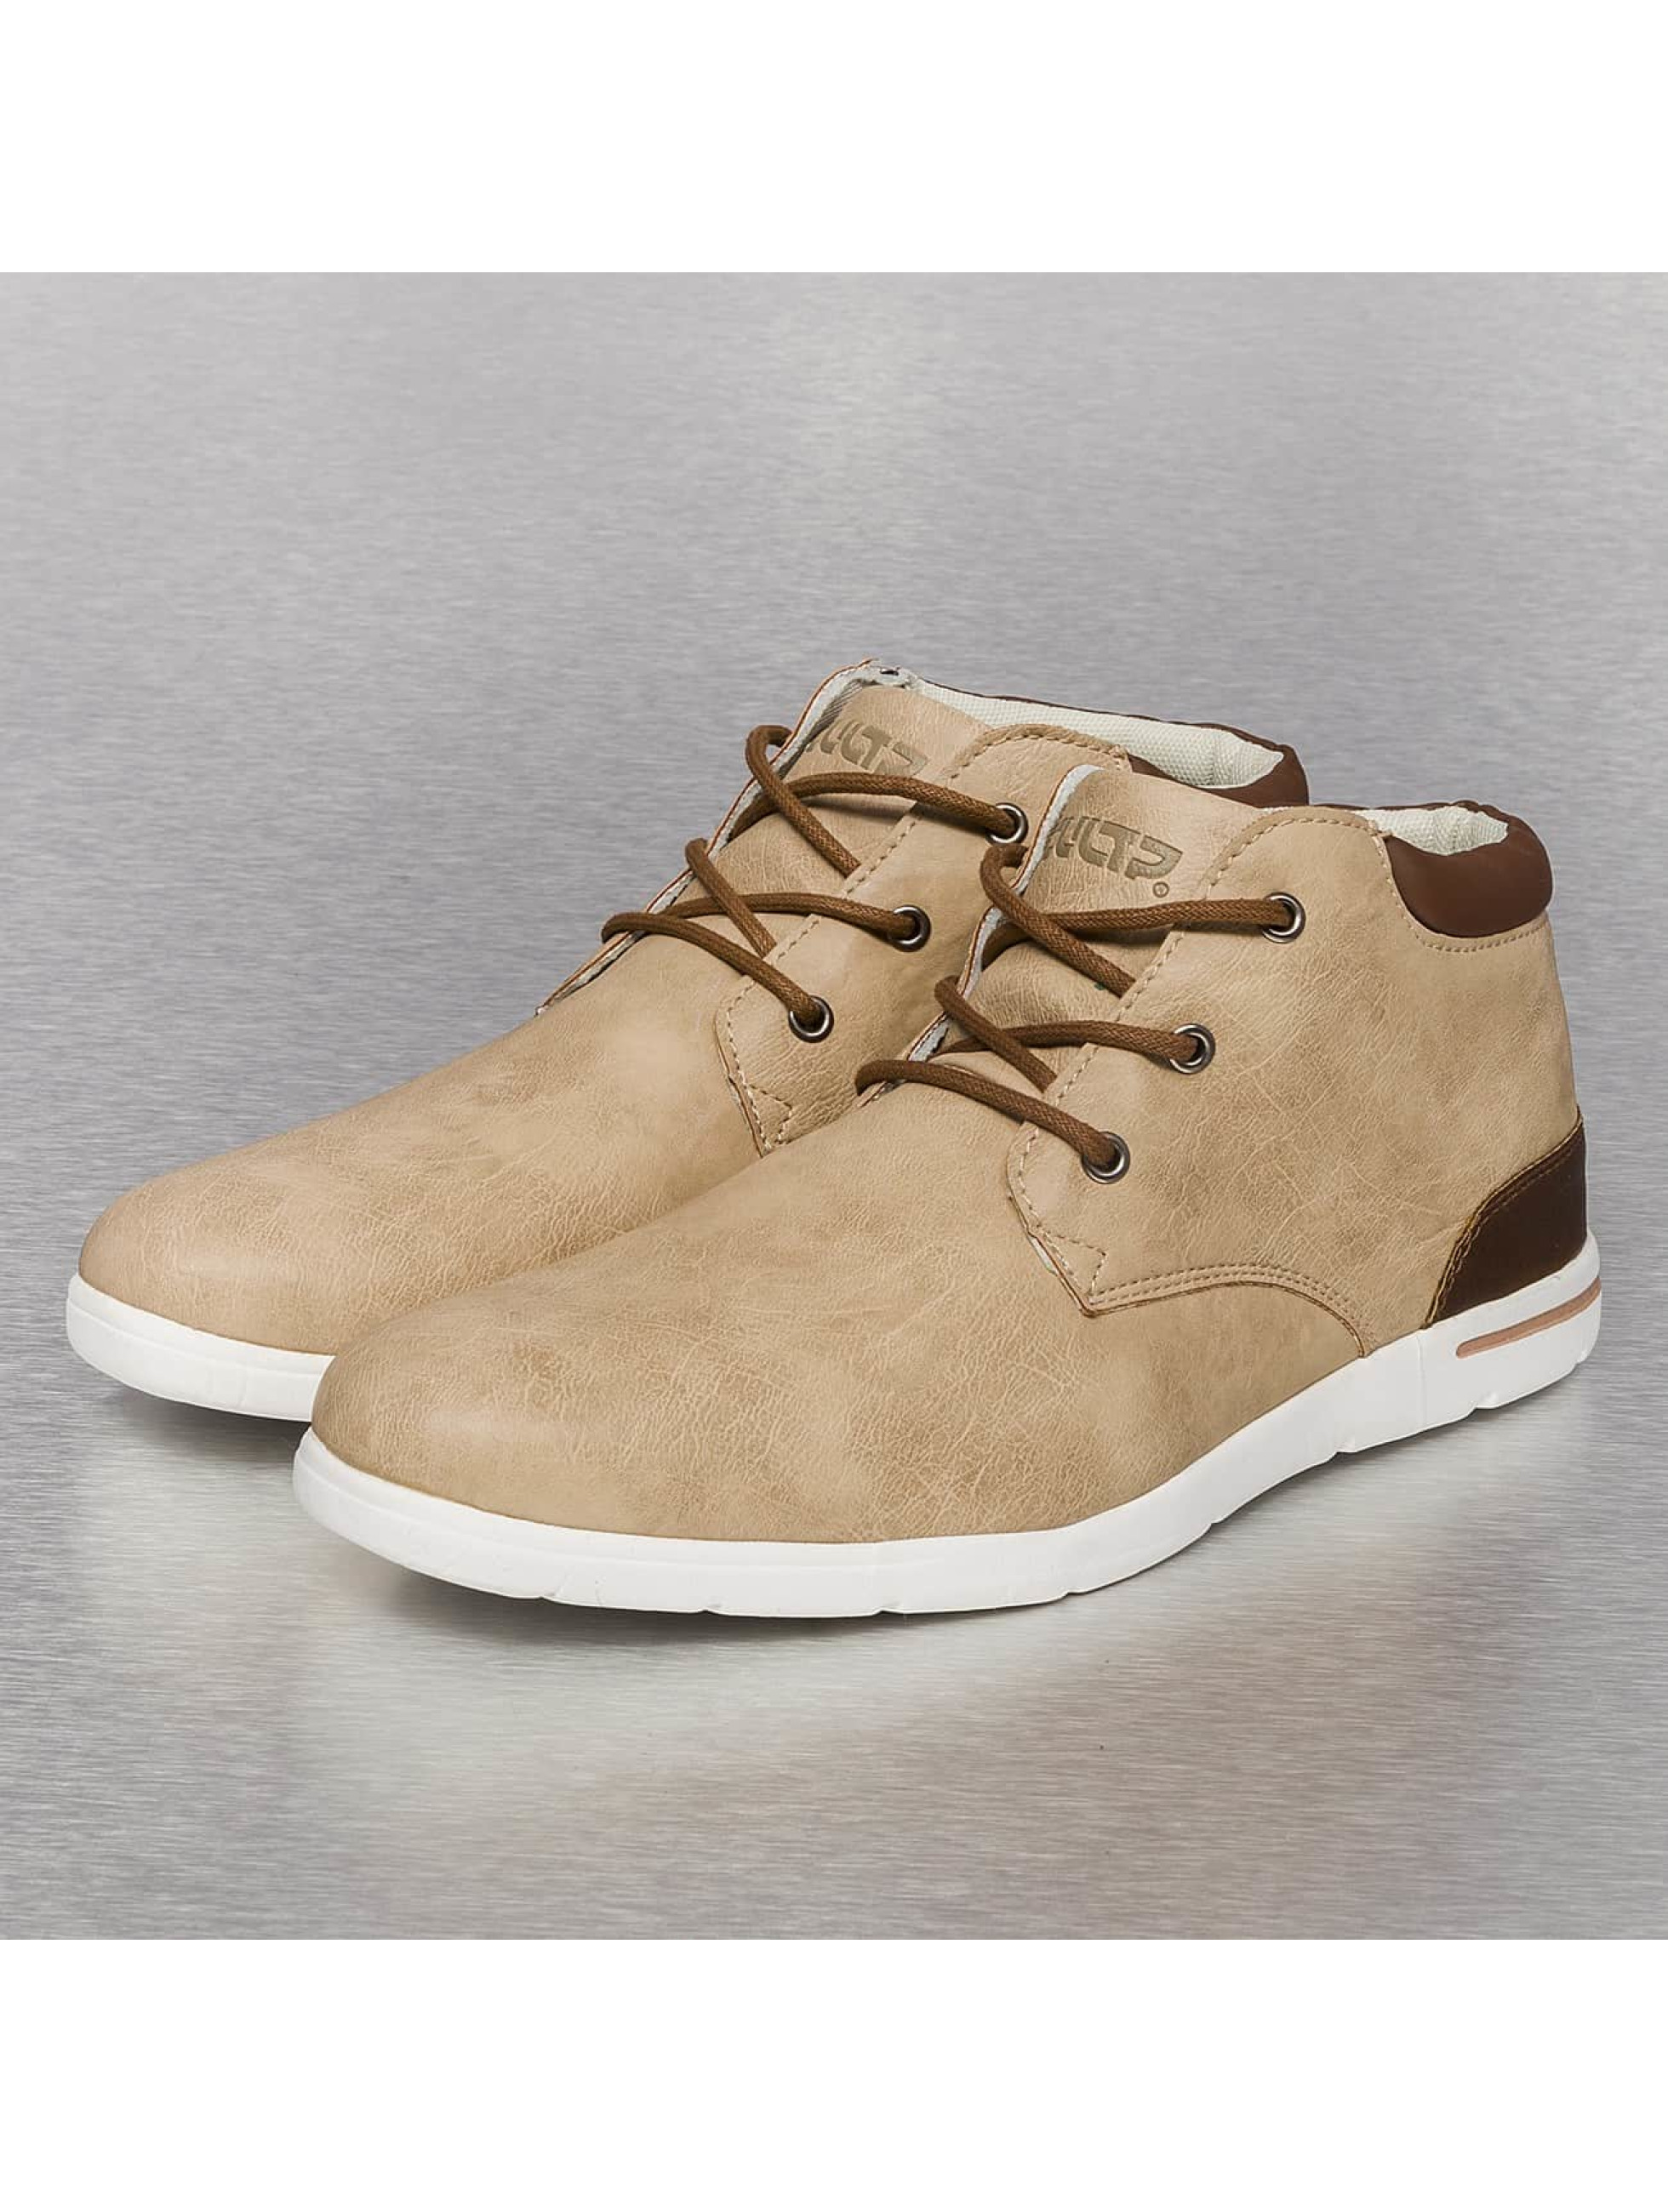 New-York-Style-Uomini-Scarpe-Sneaker-Gero